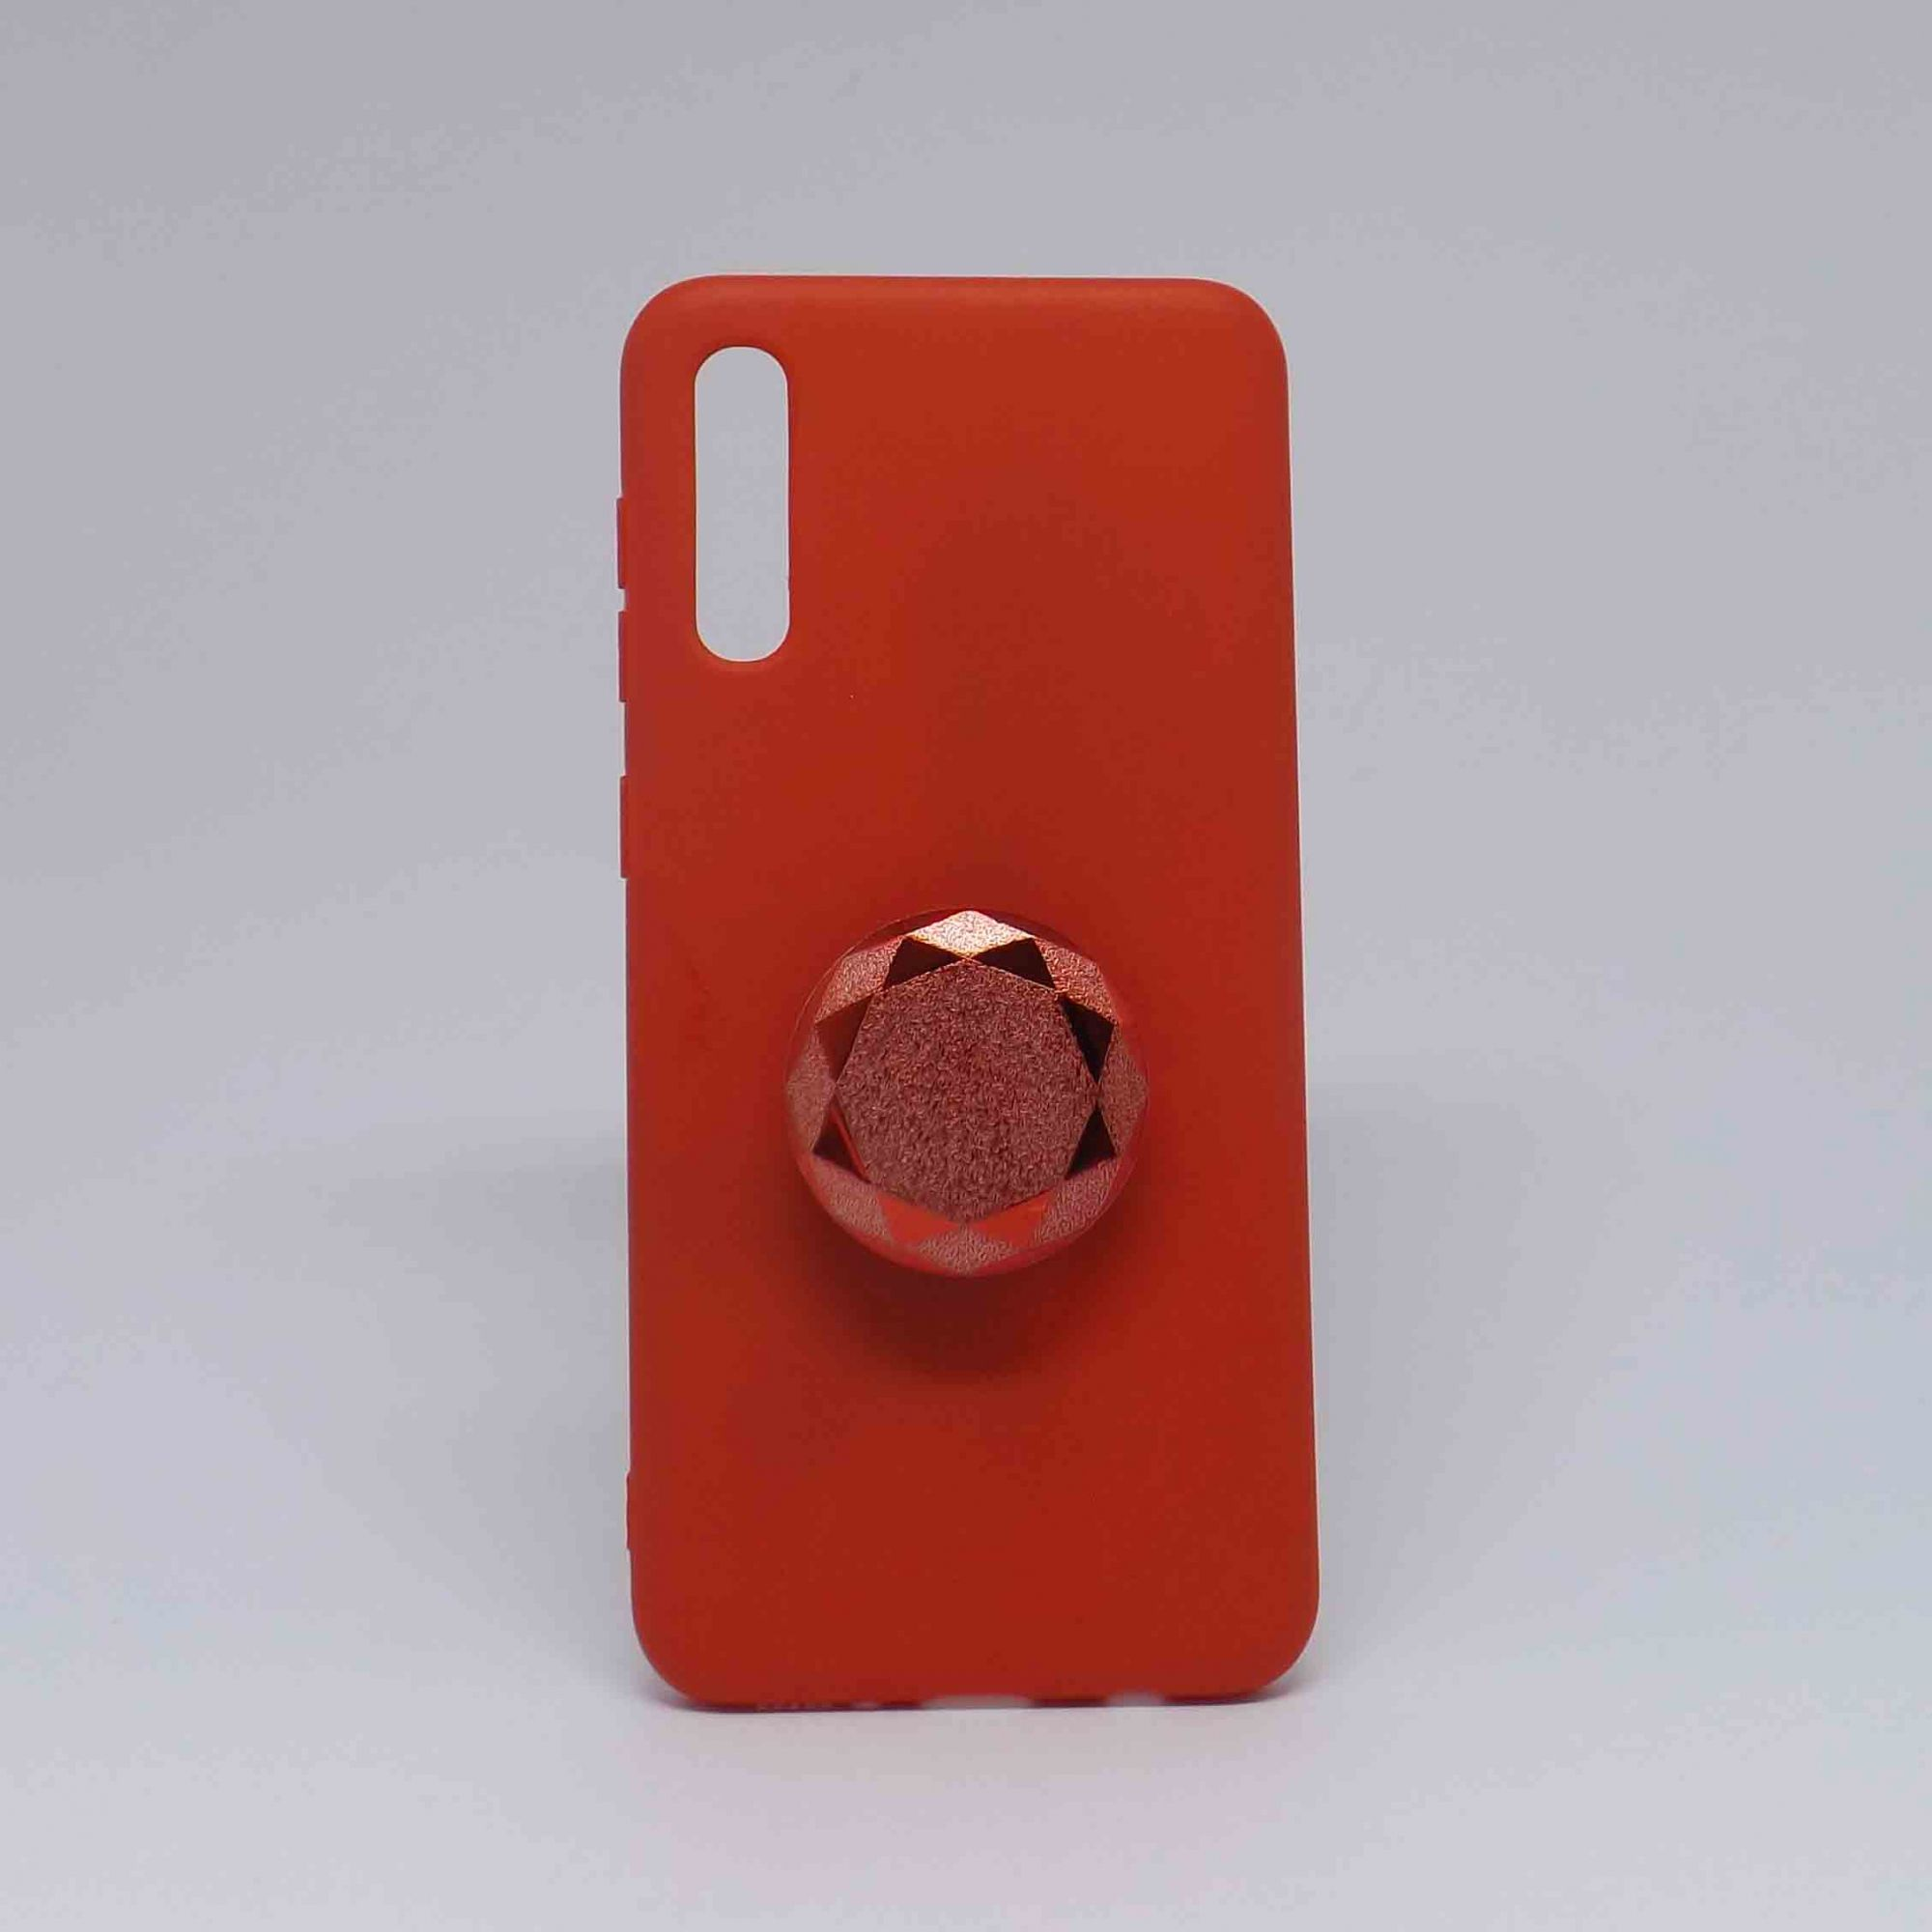 Capa Samsung Galaxy A50 com Pop Case